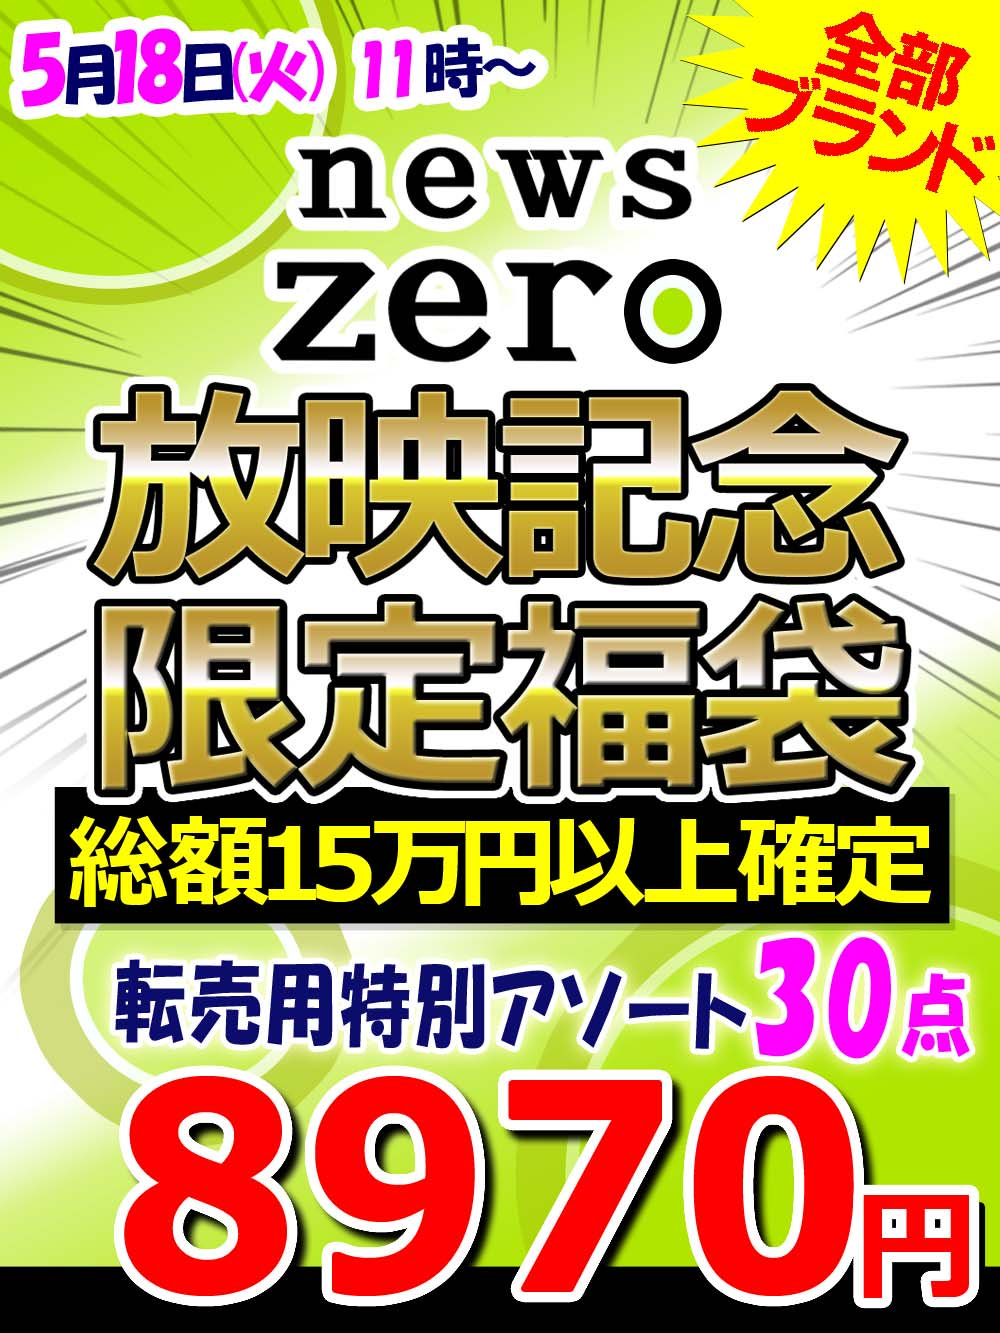 【news zero】テレビ放映記念★総額15万円以上確定特別福袋 【転売用ブランド30点】8970円